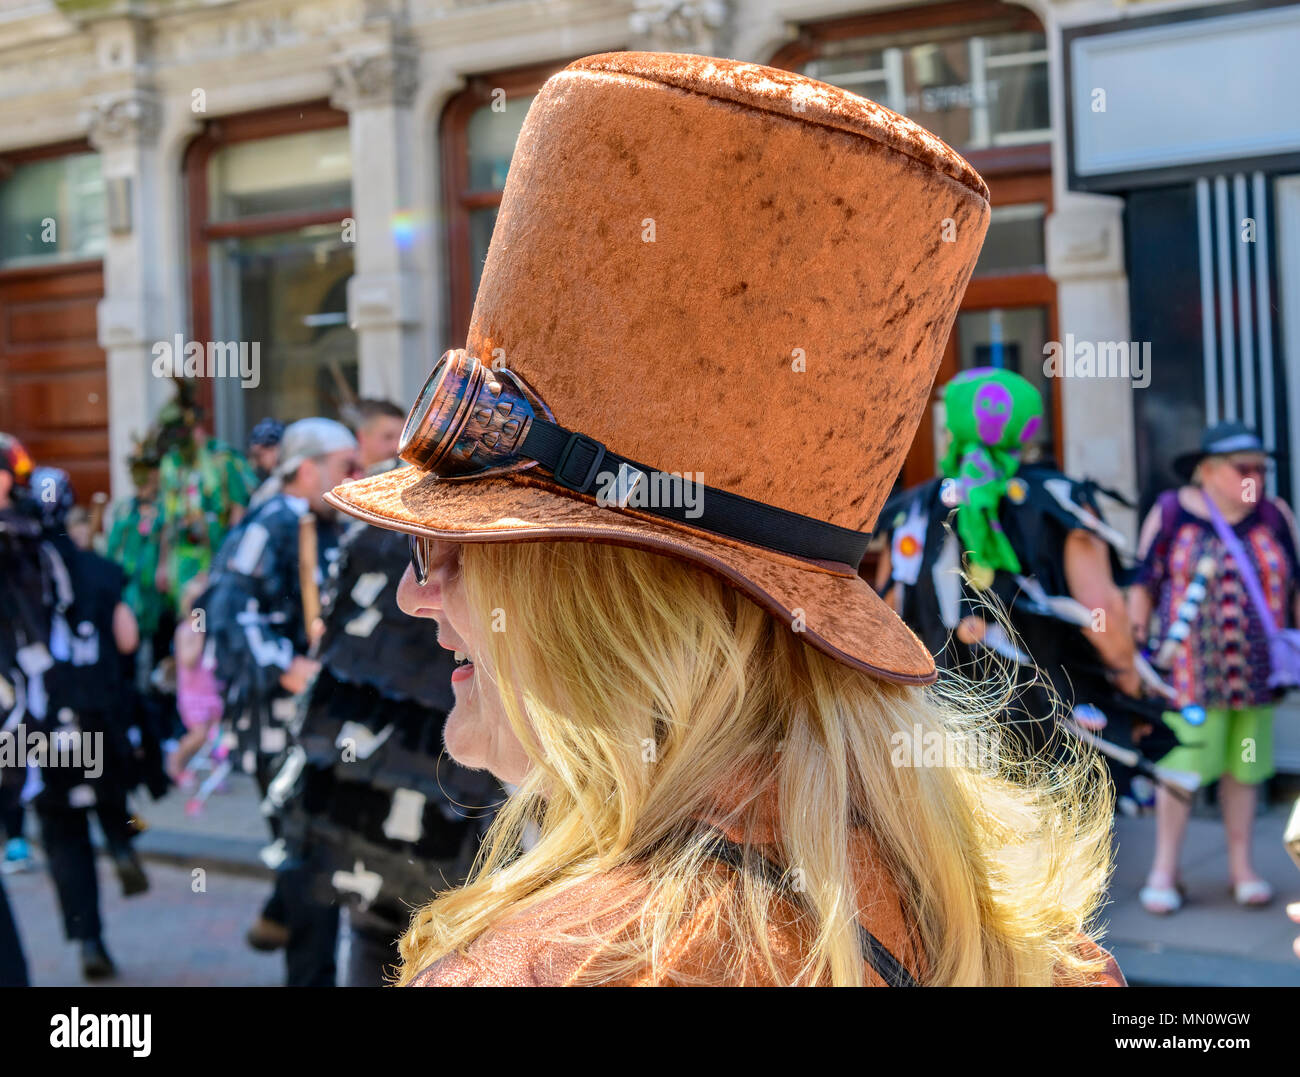 Funny Headgear Imágenes De Stock   Funny Headgear Fotos De Stock - Alamy 04aefd8f9d0